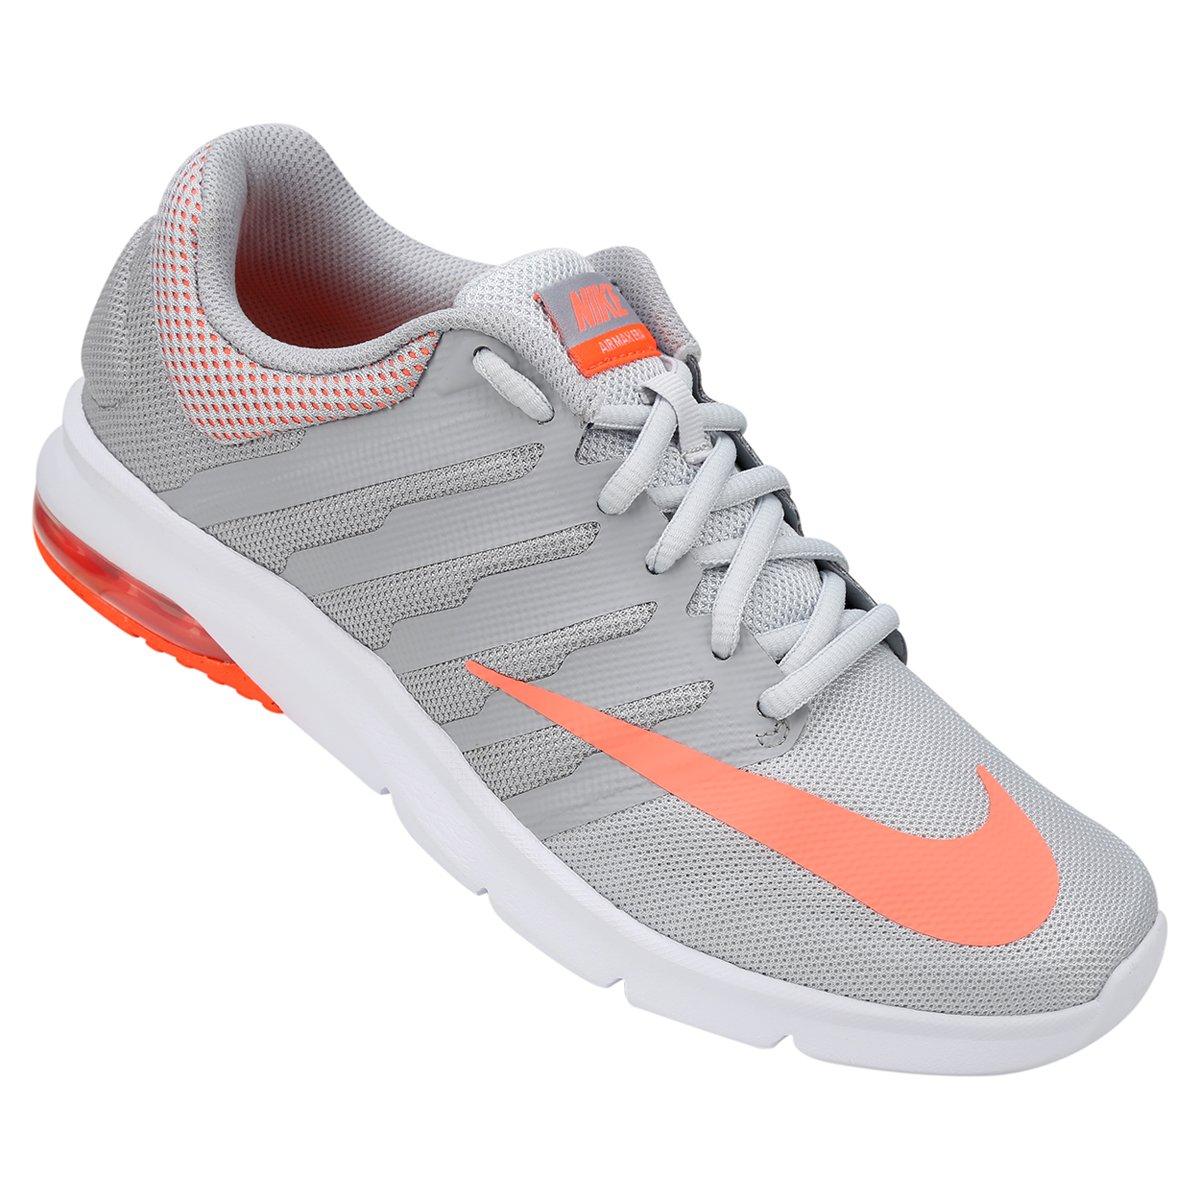 Tênis Nike Air Max Era Feminino - Compre Agora  110a36f0d9590